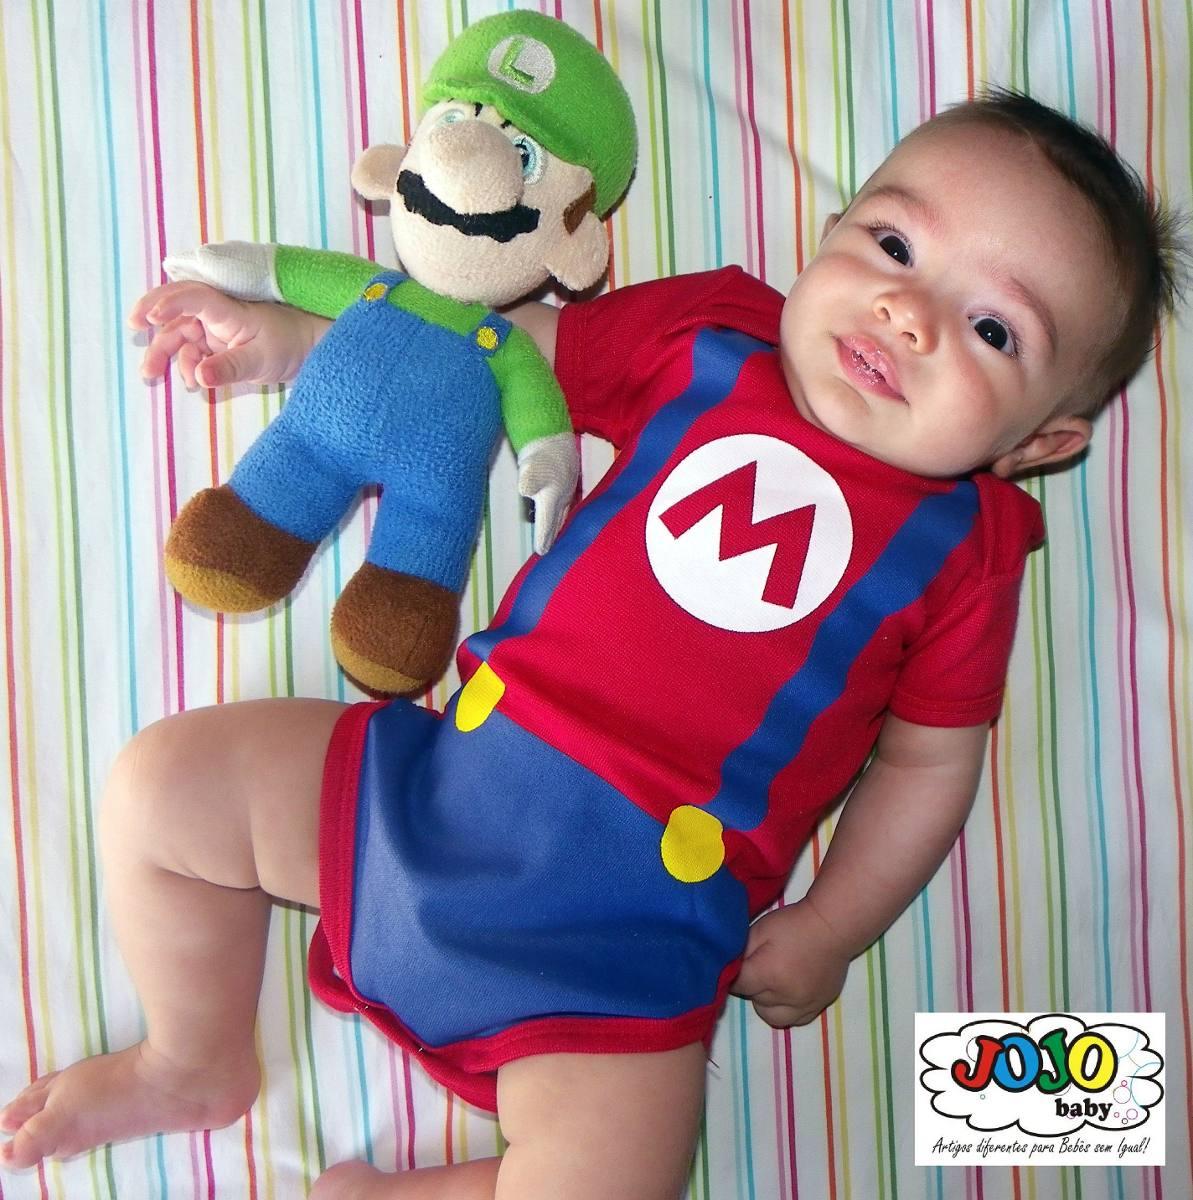 jojo baby - body fantasia bebê super mário bros. Carregando zoom. 5f1981b7ad1